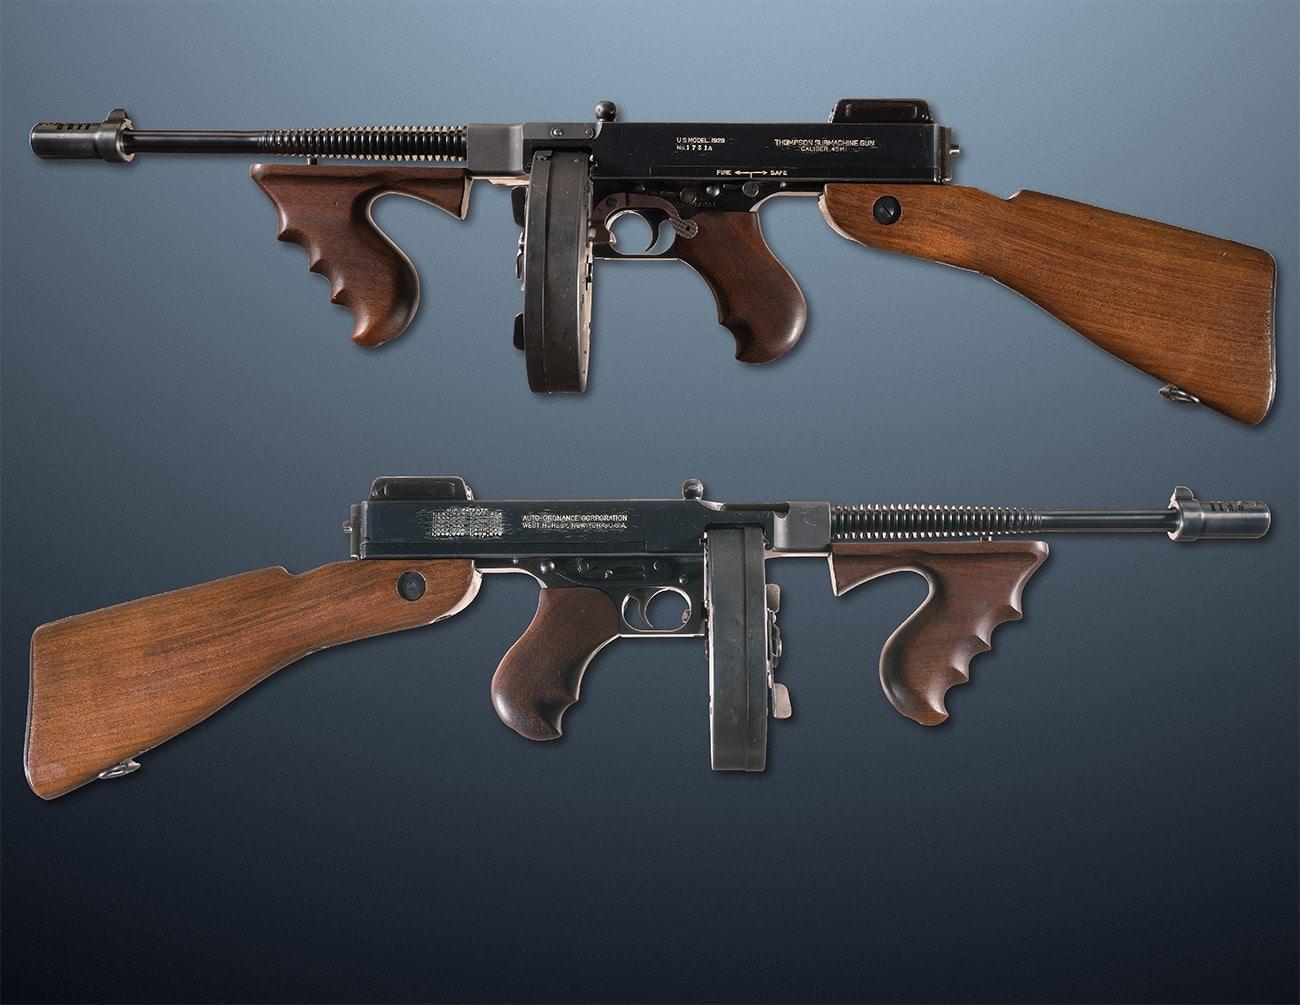 1928 us model navy thompson tommy gun smg ria